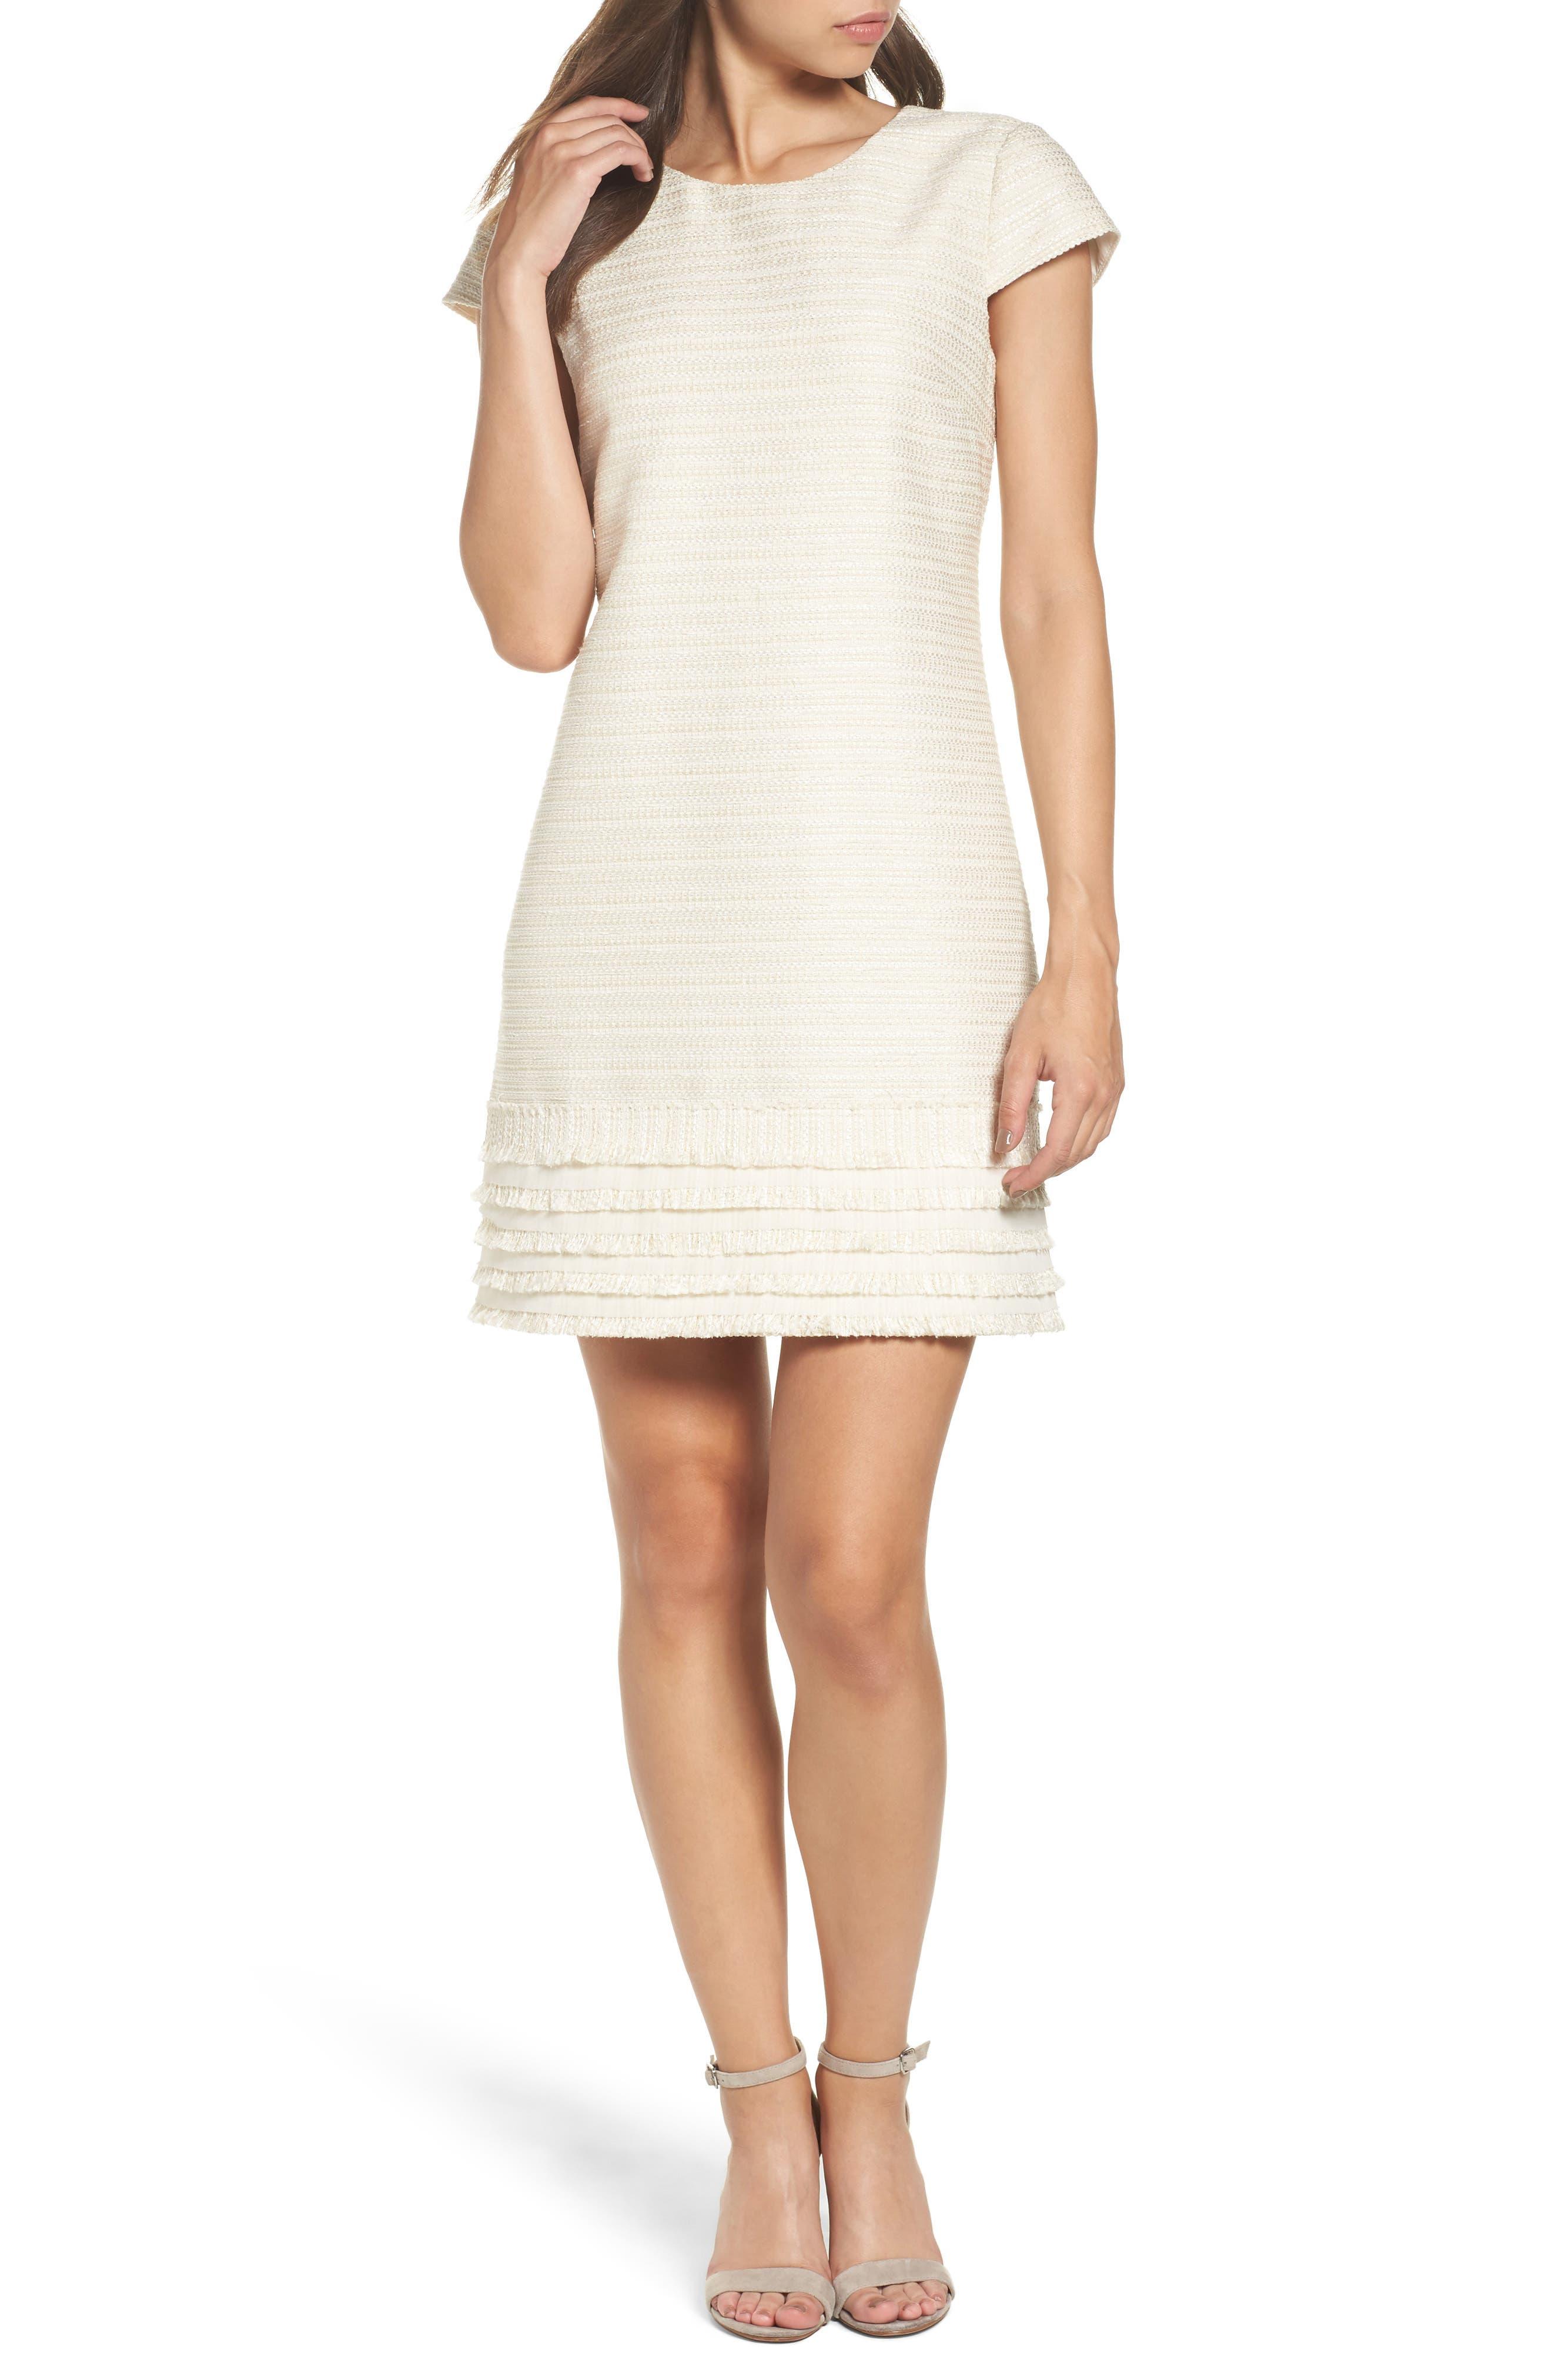 Main Image - Vince Camuto Fringed Tweed Shift Dress (Regular & Petite)